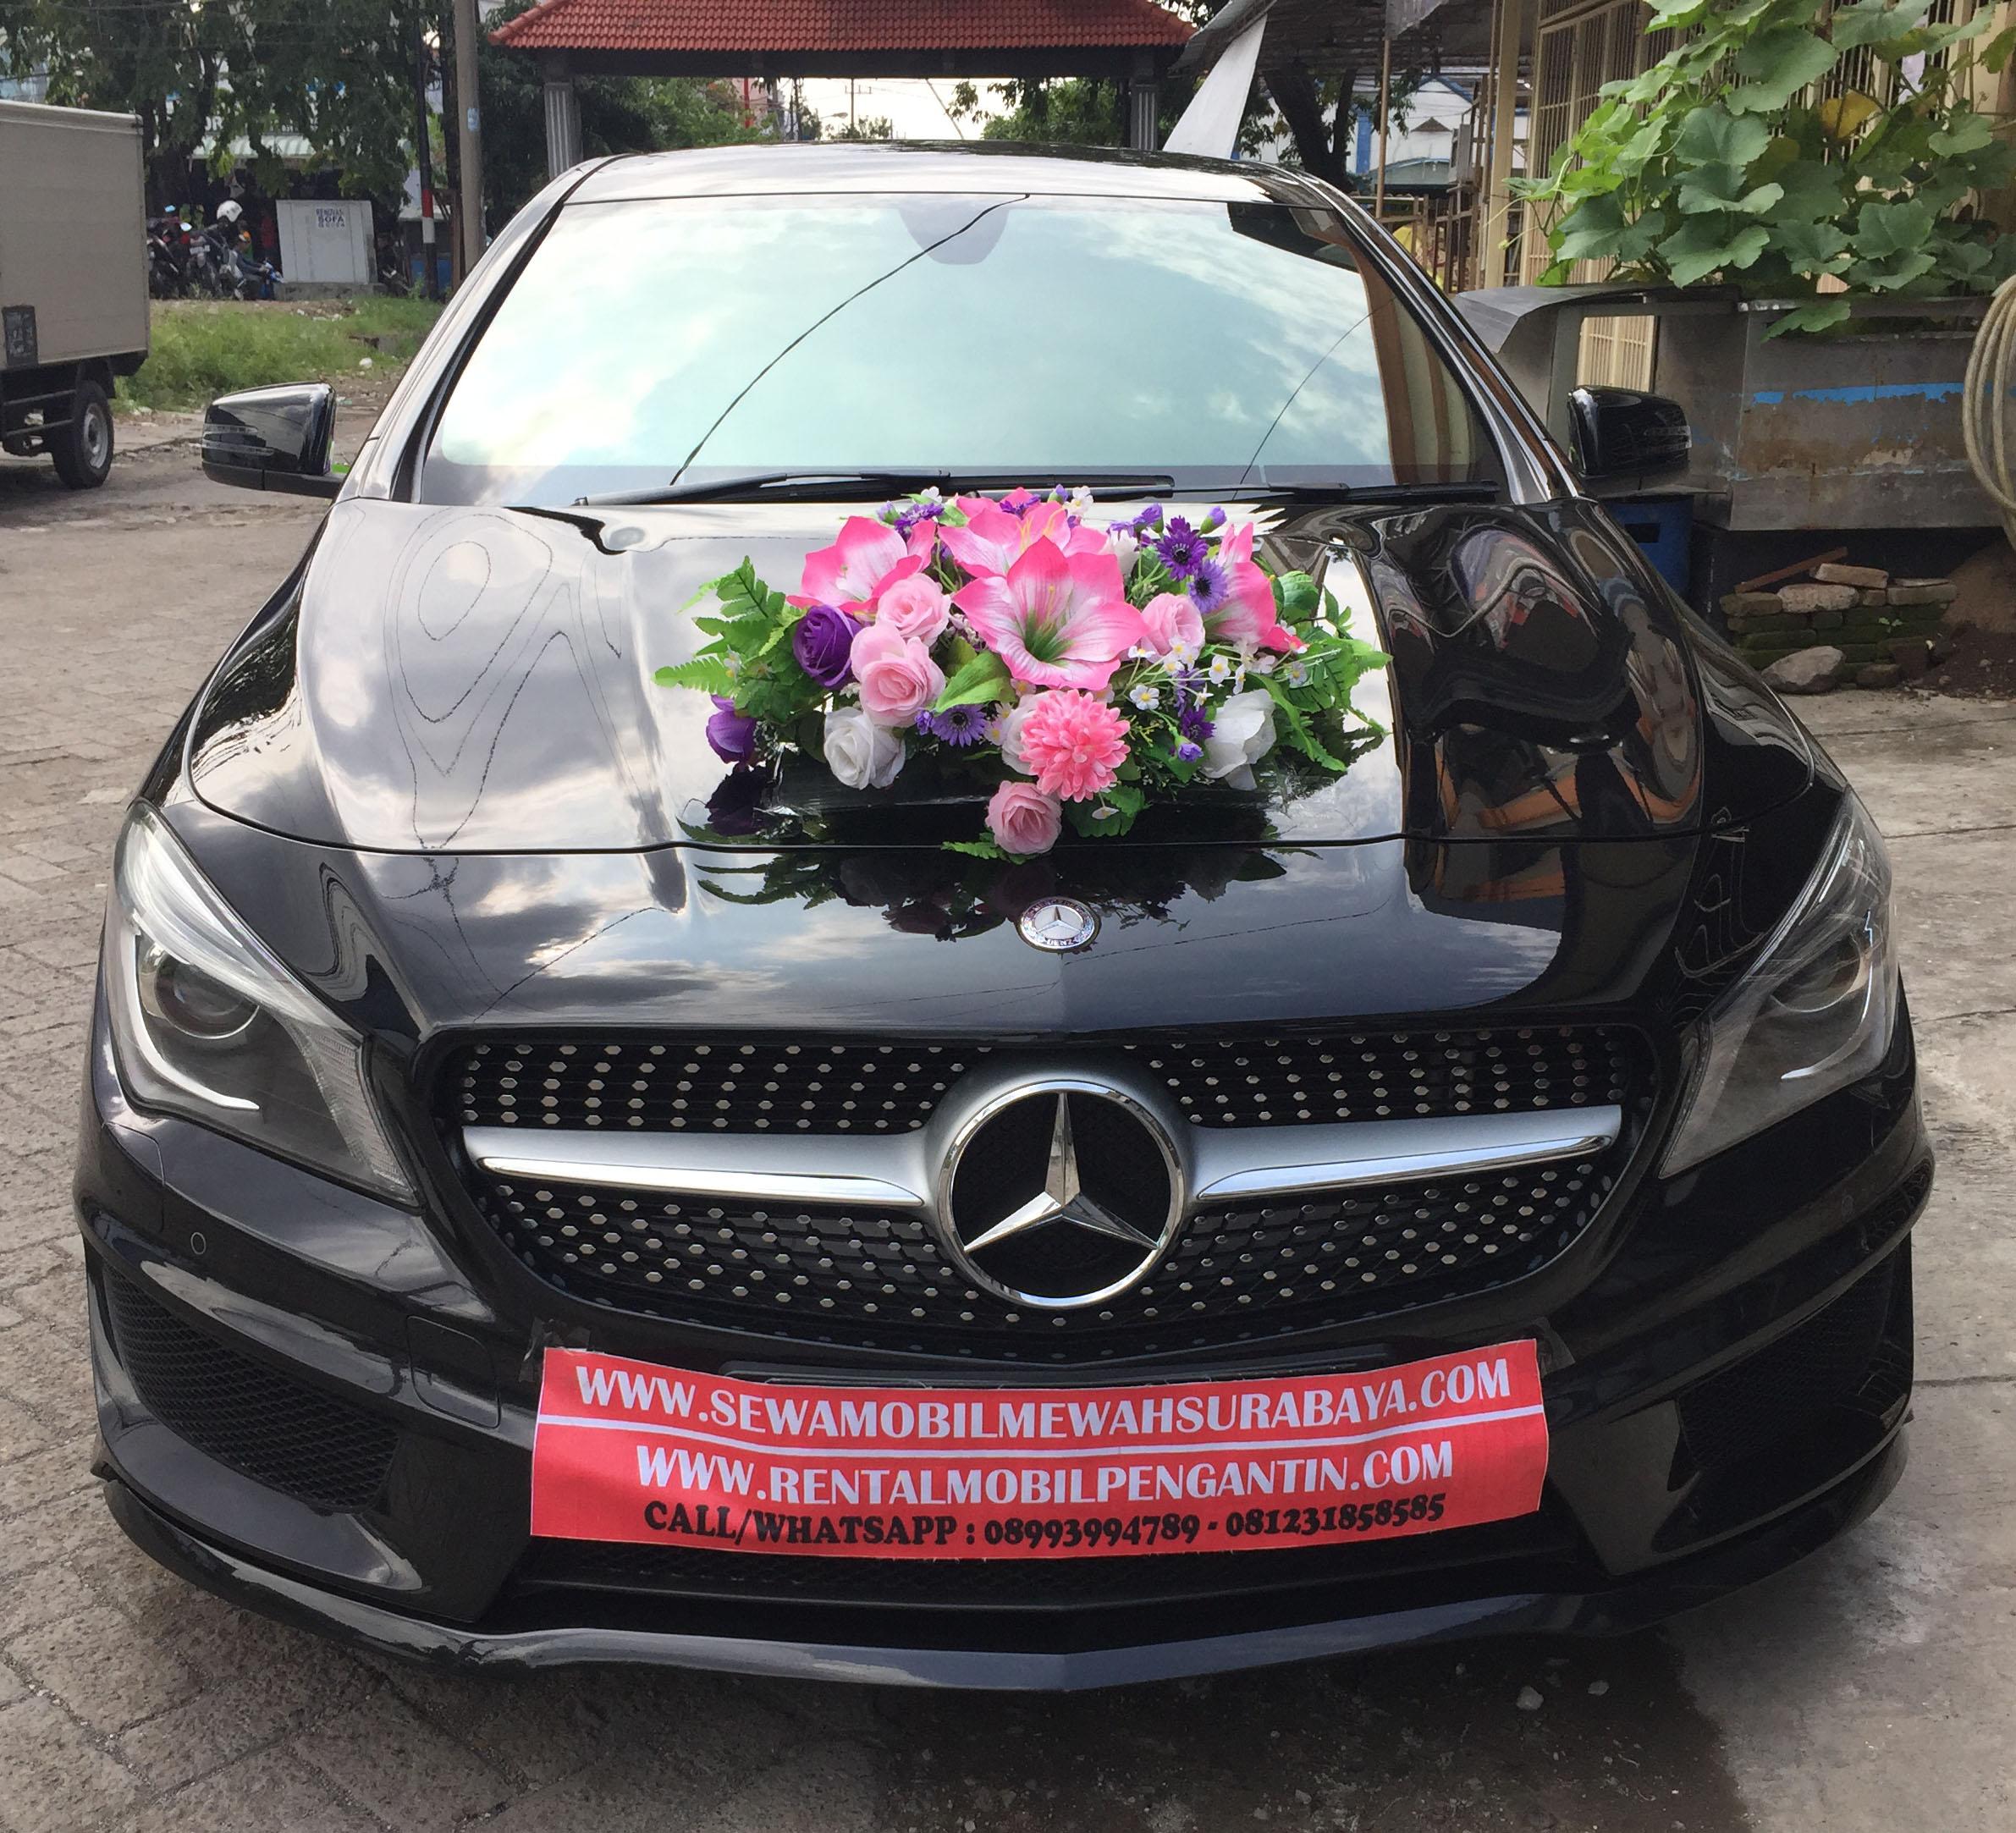 rental mobil mewah murah mercy mercedes benz cla cls wedding pengantin surabaya